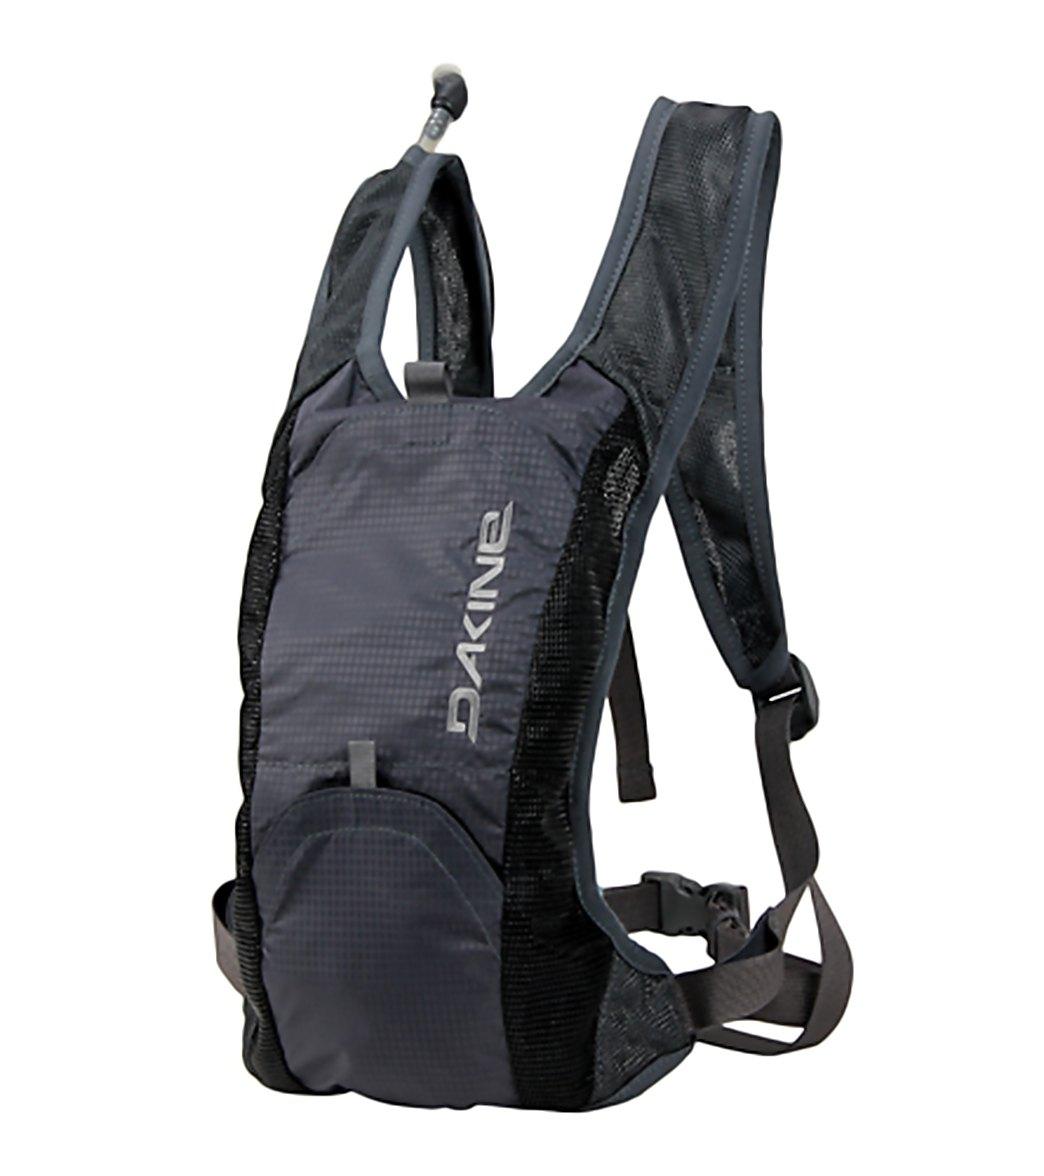 54a5c2675 Dakine Waterman Hydration Pack